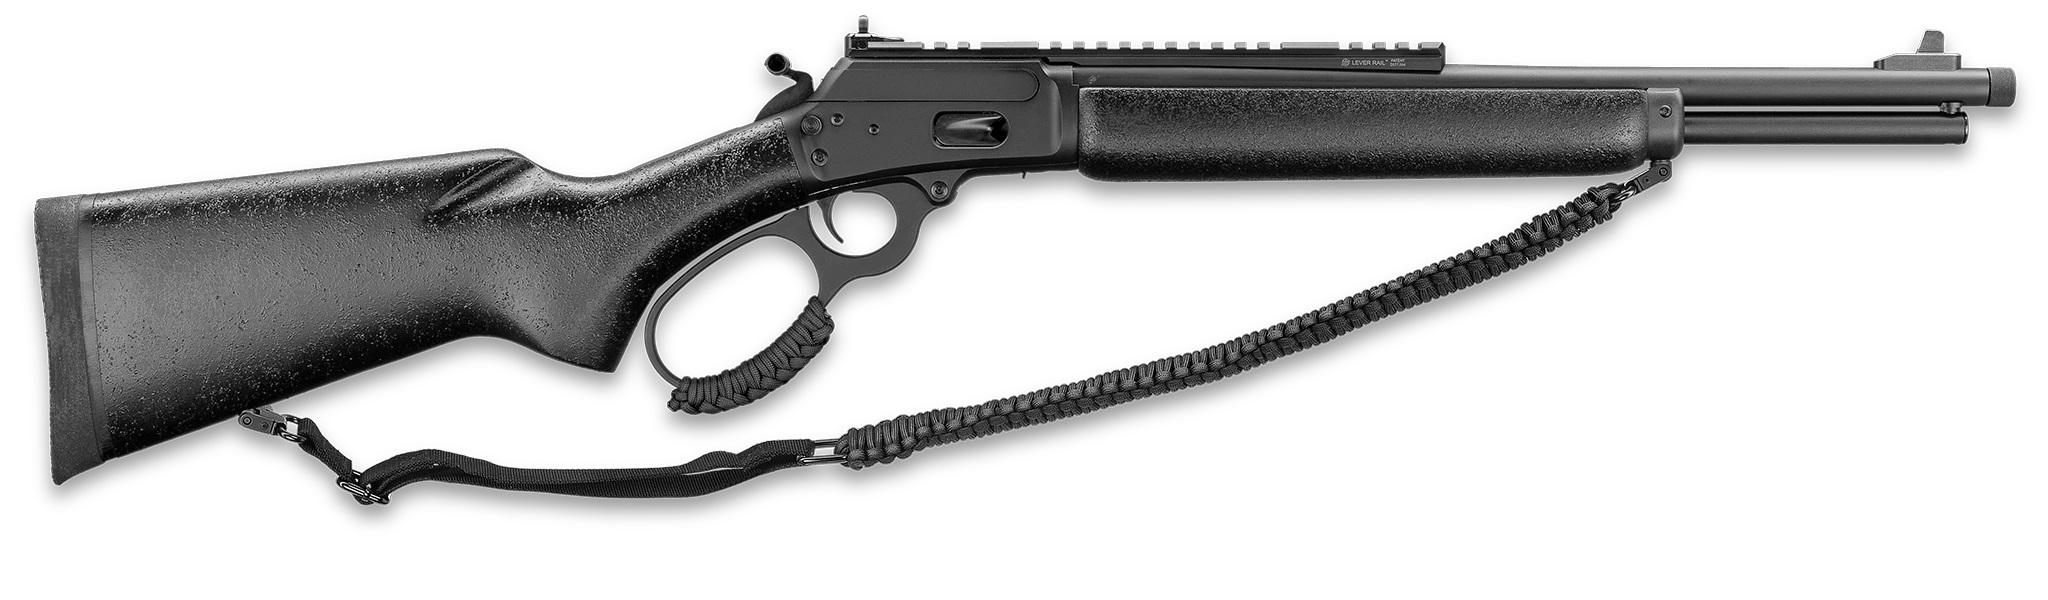 Marlin 1894 Dark Series 357 Magnum | 38 Special